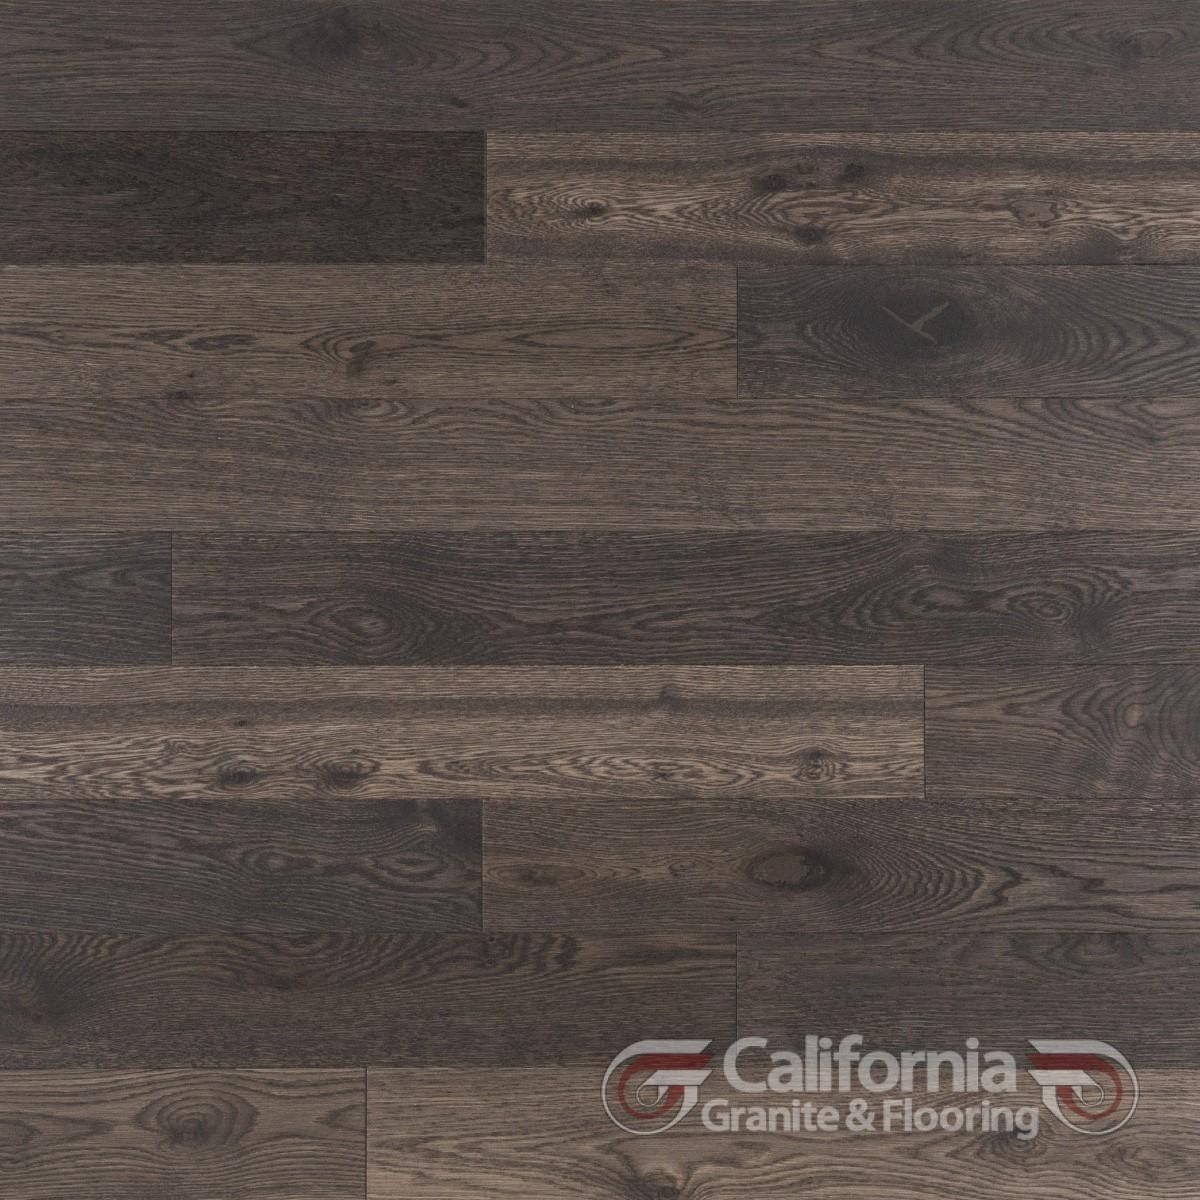 hardwood-flooring-white-oak-lunar-eclipse-character-brushed-2